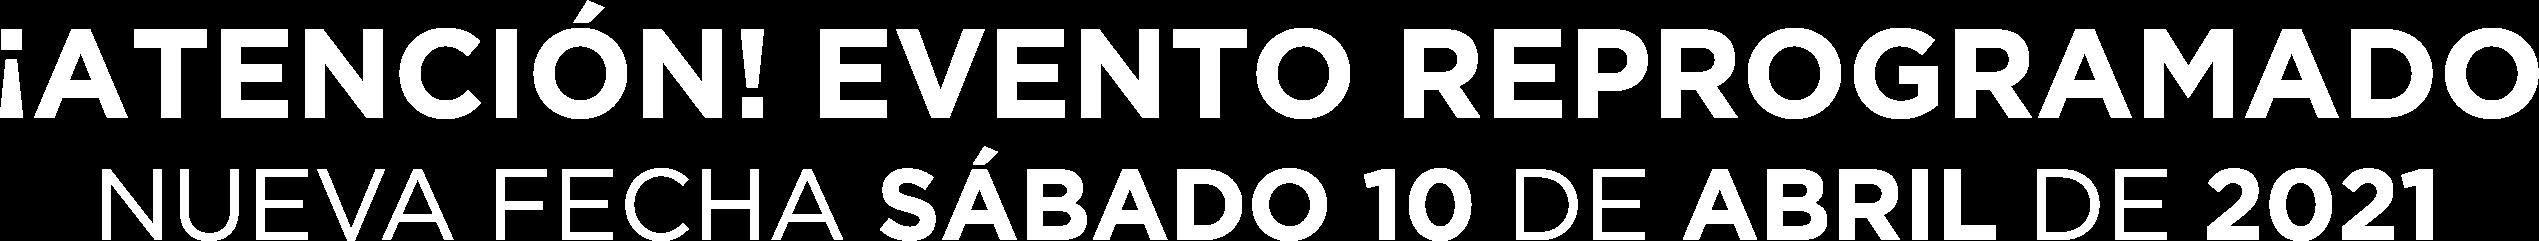 Evento reprogramado - Nueva fecha: sábado 10 de abril 2021